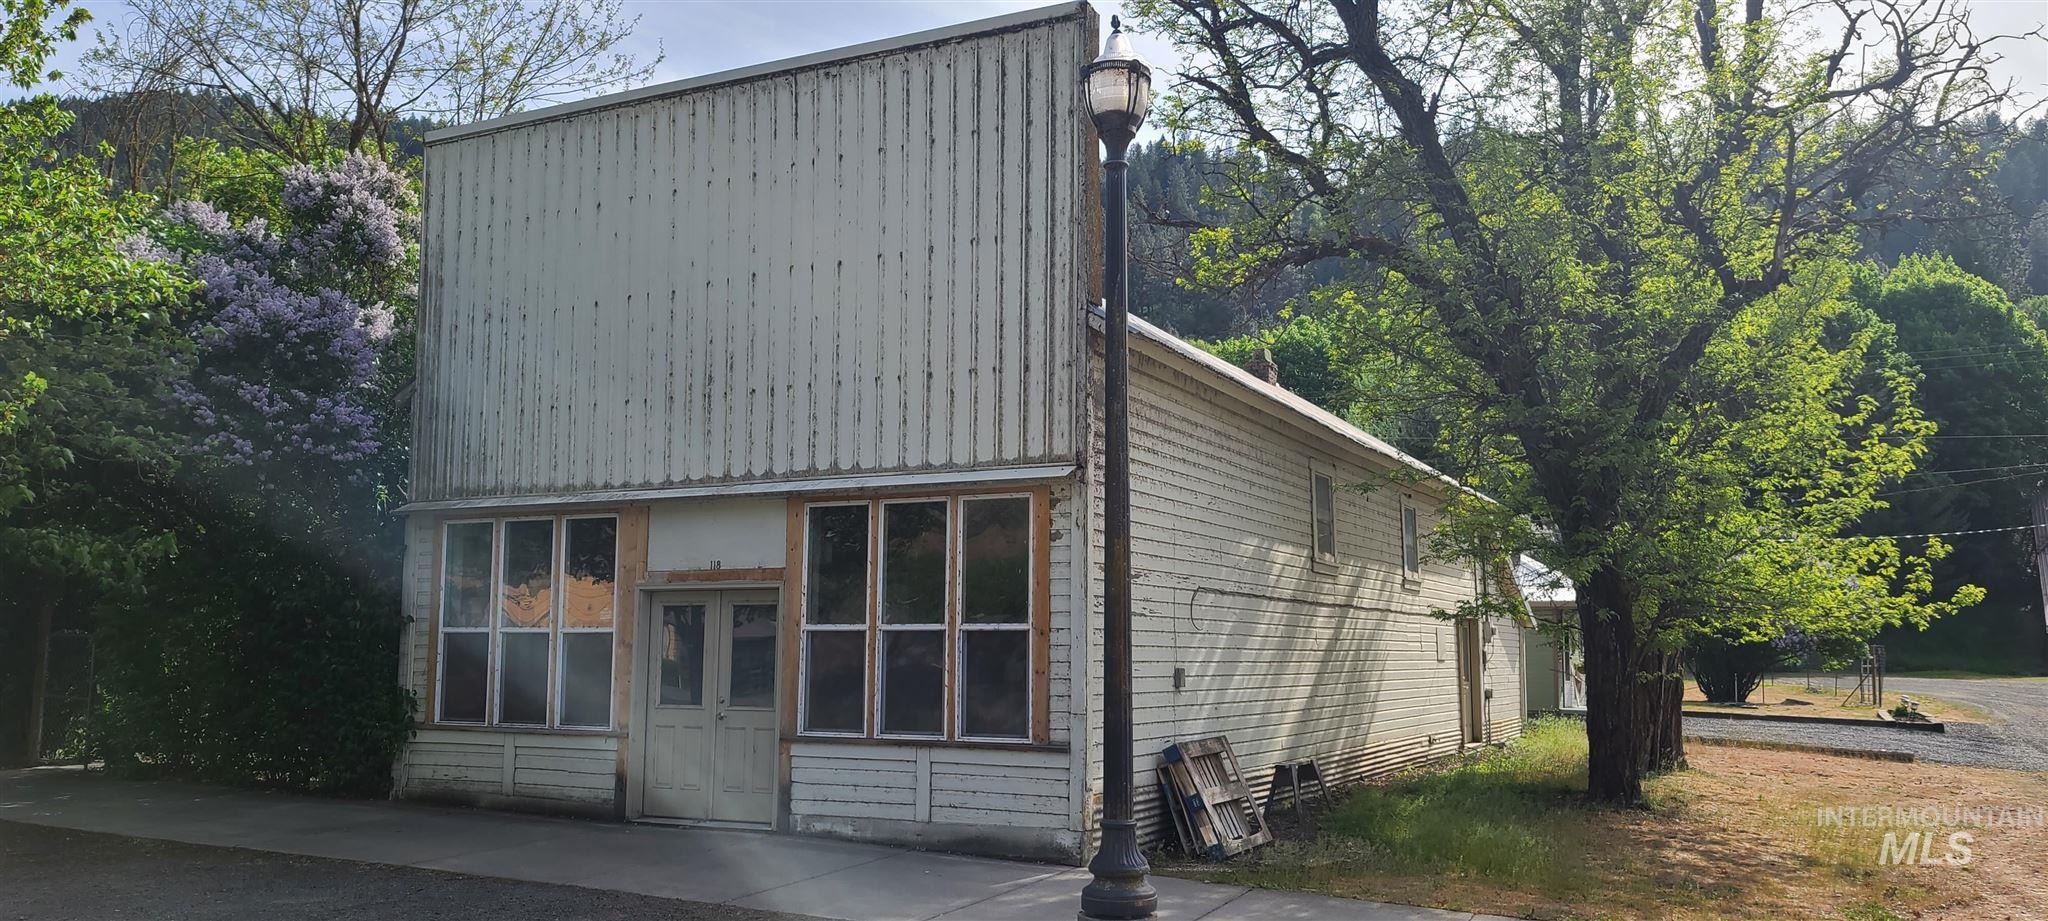 116 N Main St Property Photo 1